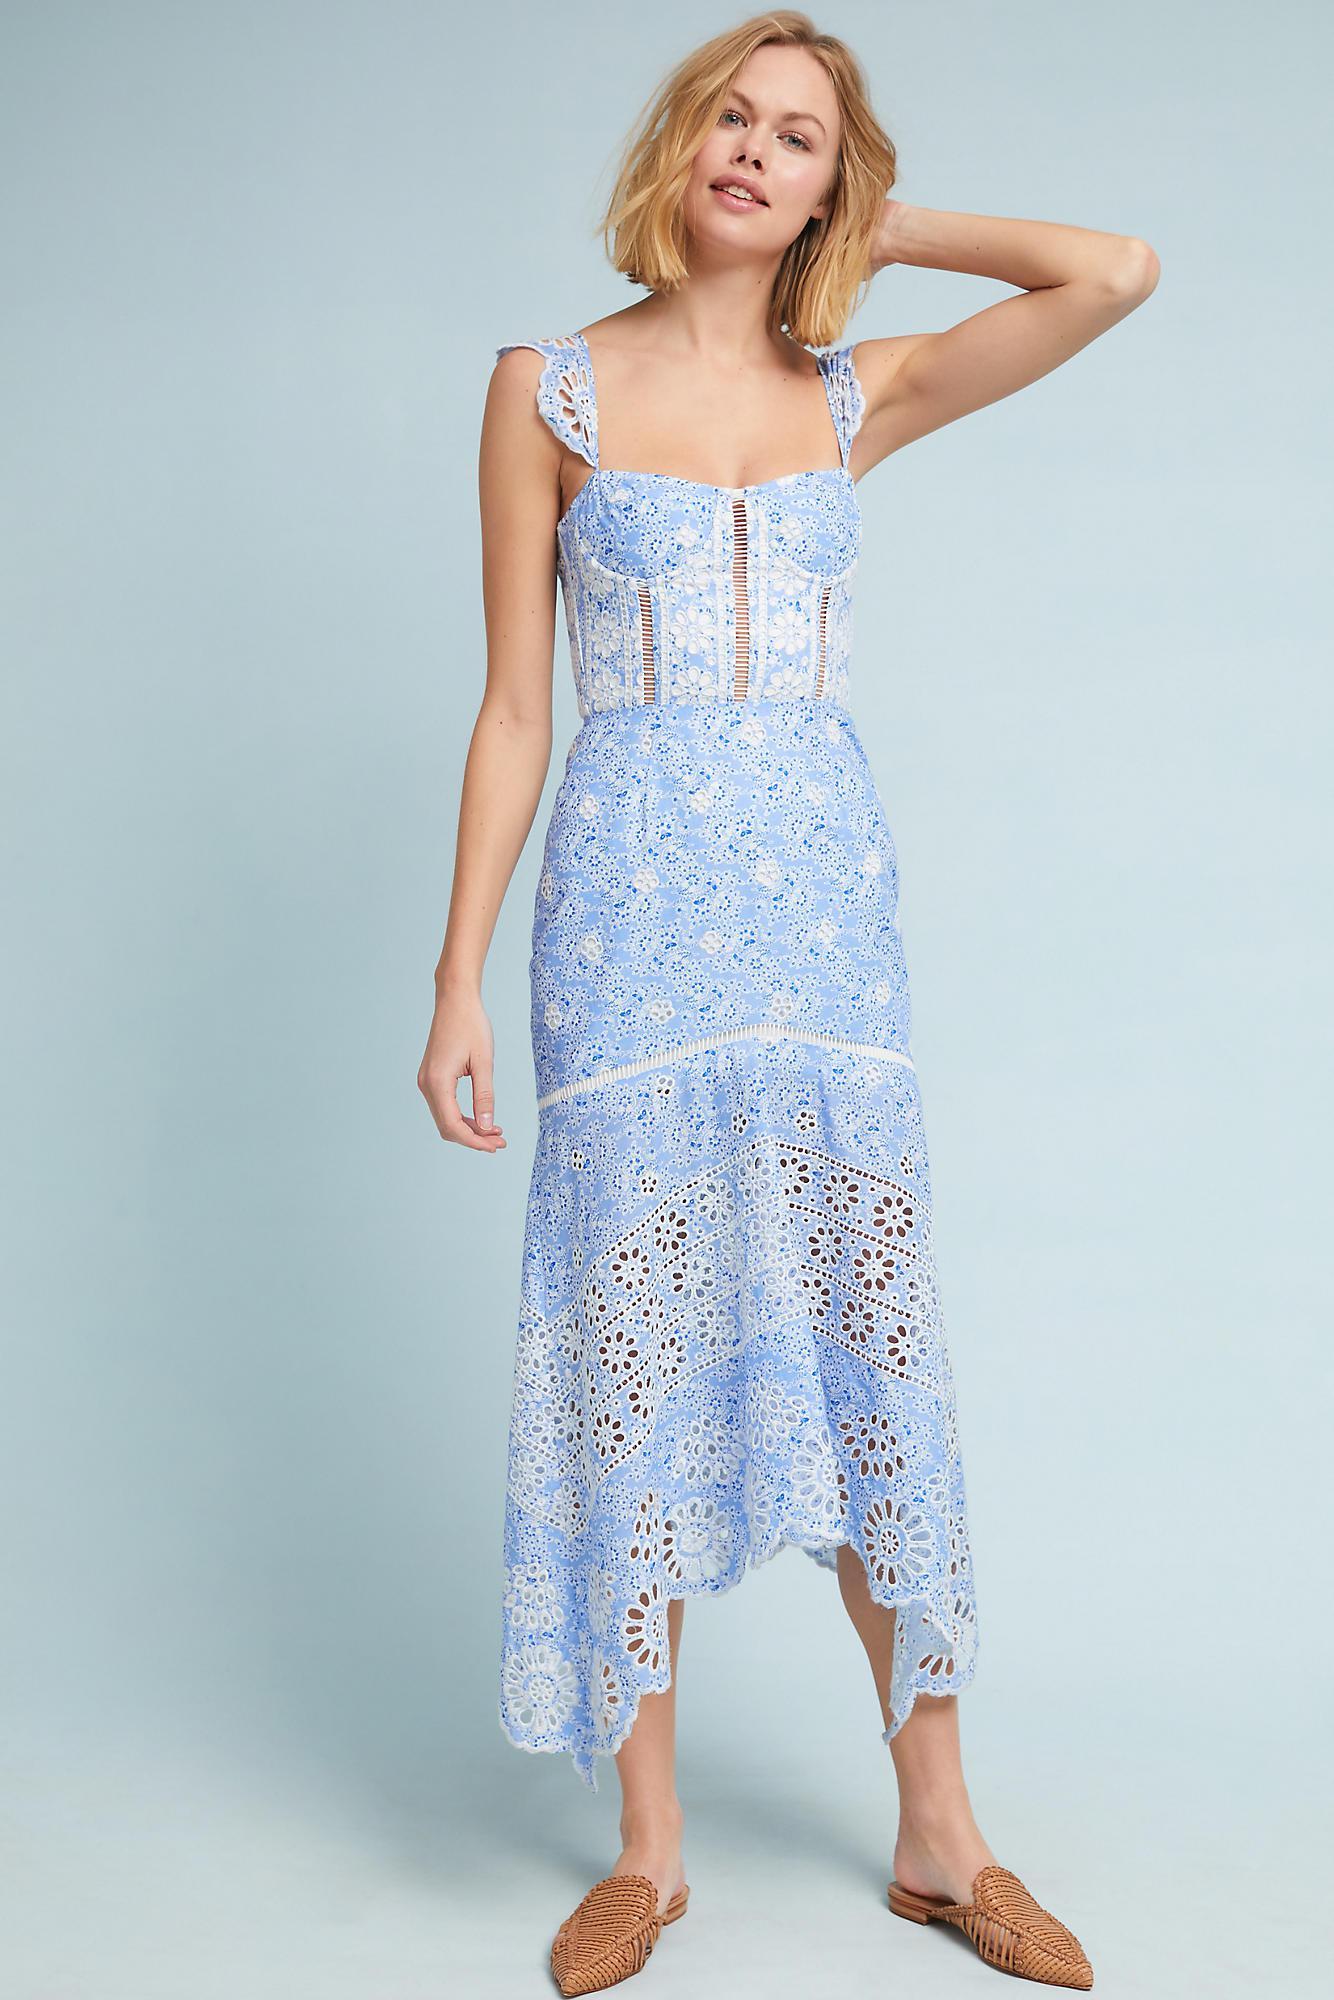 Lyst - Karina Grimaldi Ivy Corseted Dress in Blue